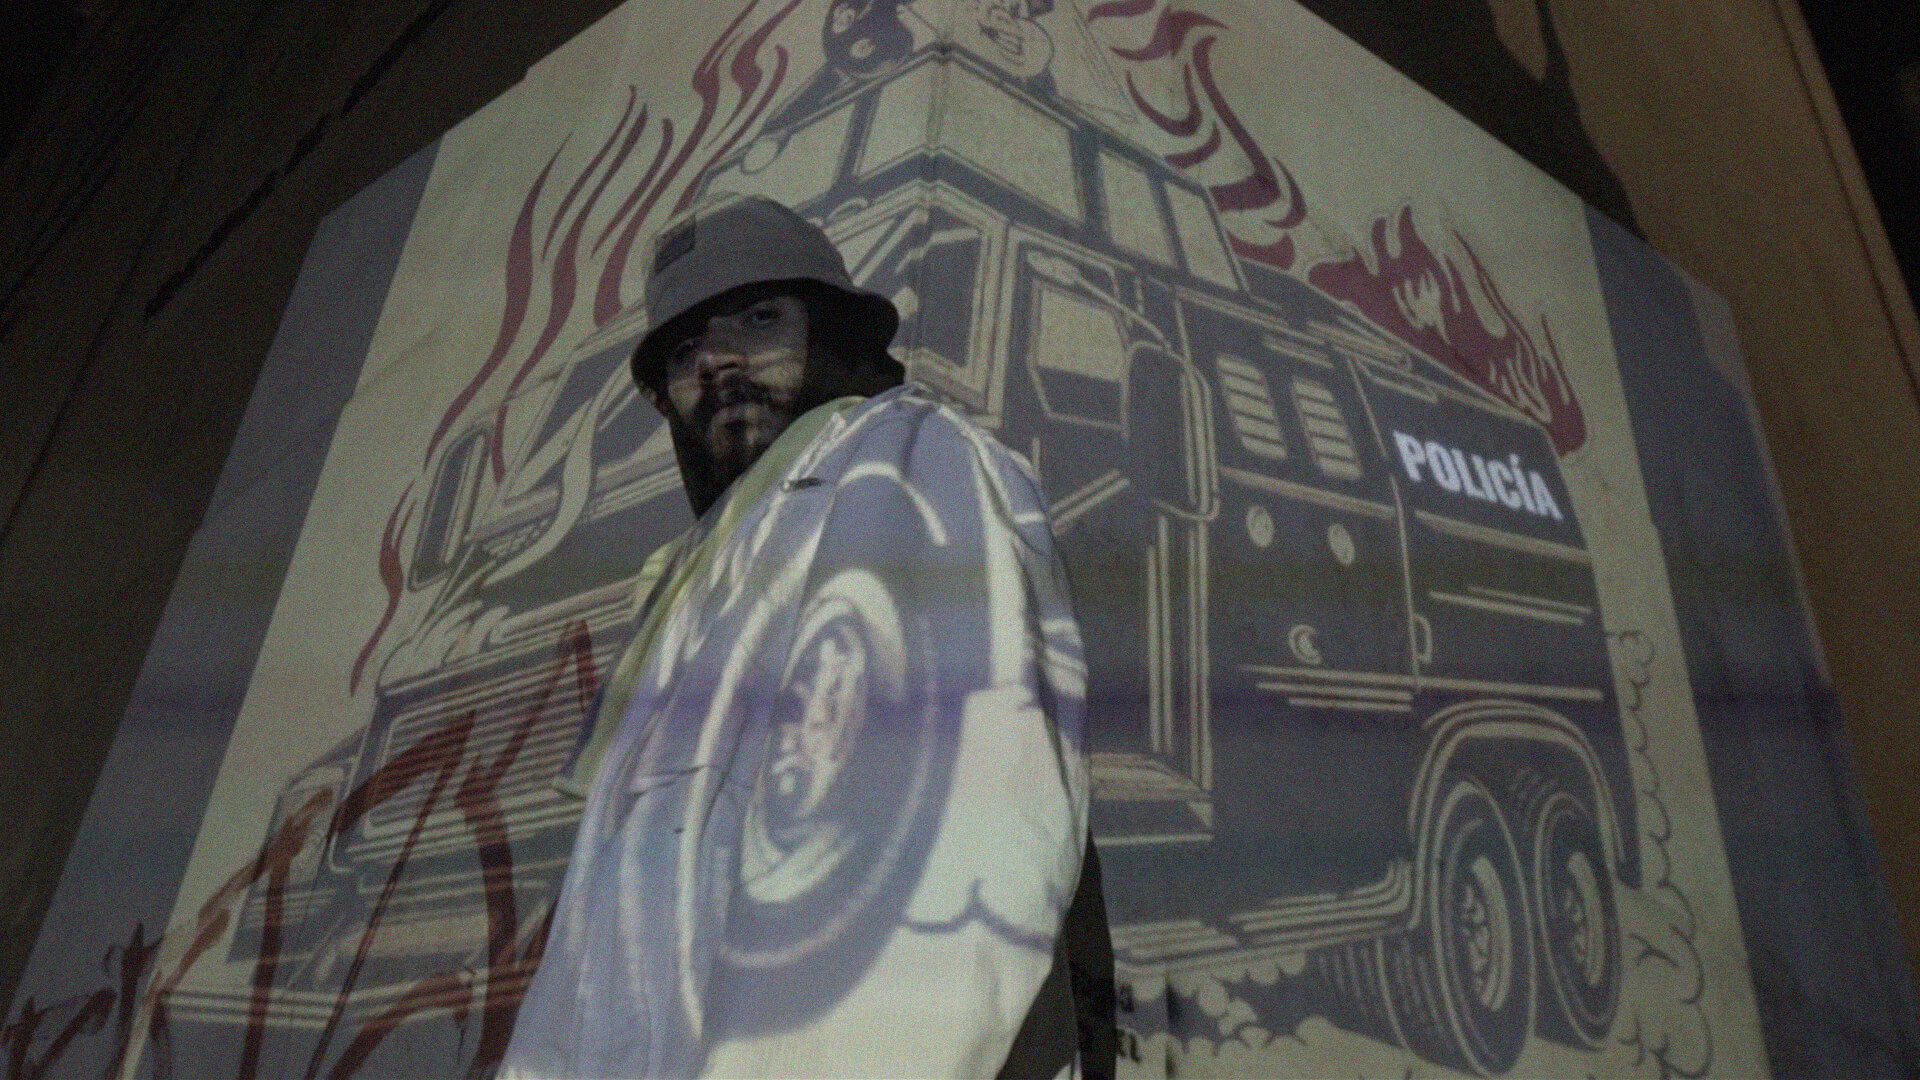 PACIFISTA! presenta: Quién dio la orden (freestyle) feat. N. Hardem & MA.SA